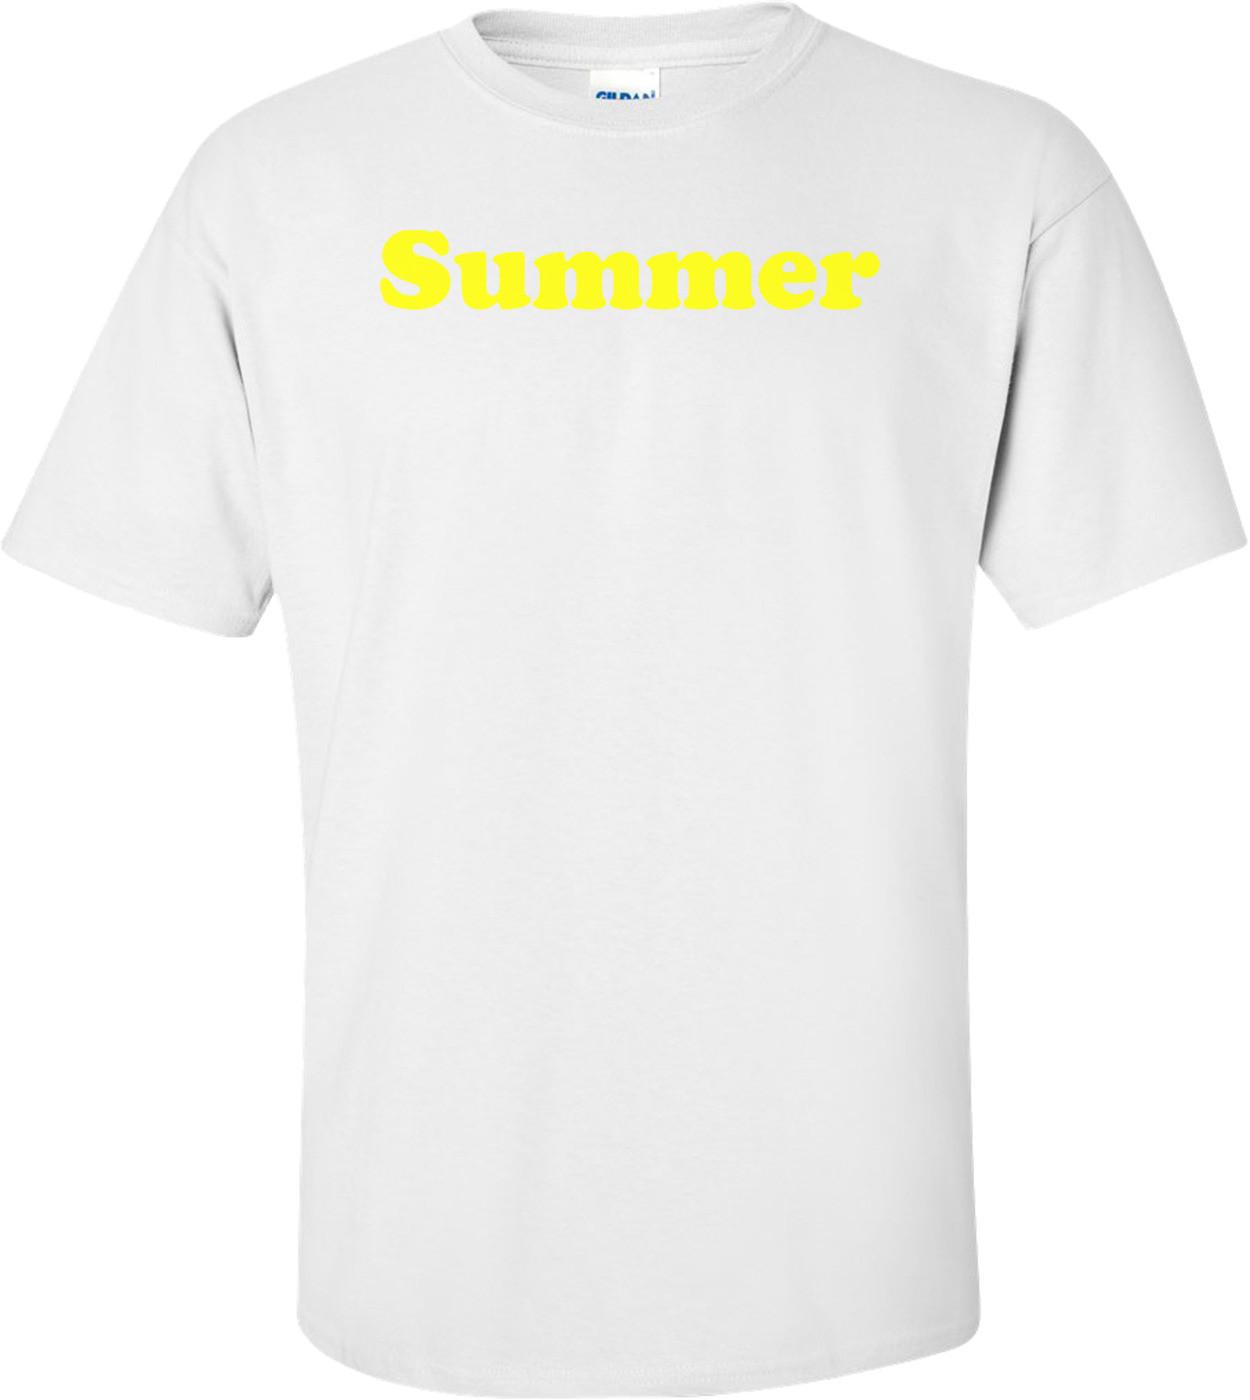 Summer - Maternity Shirt